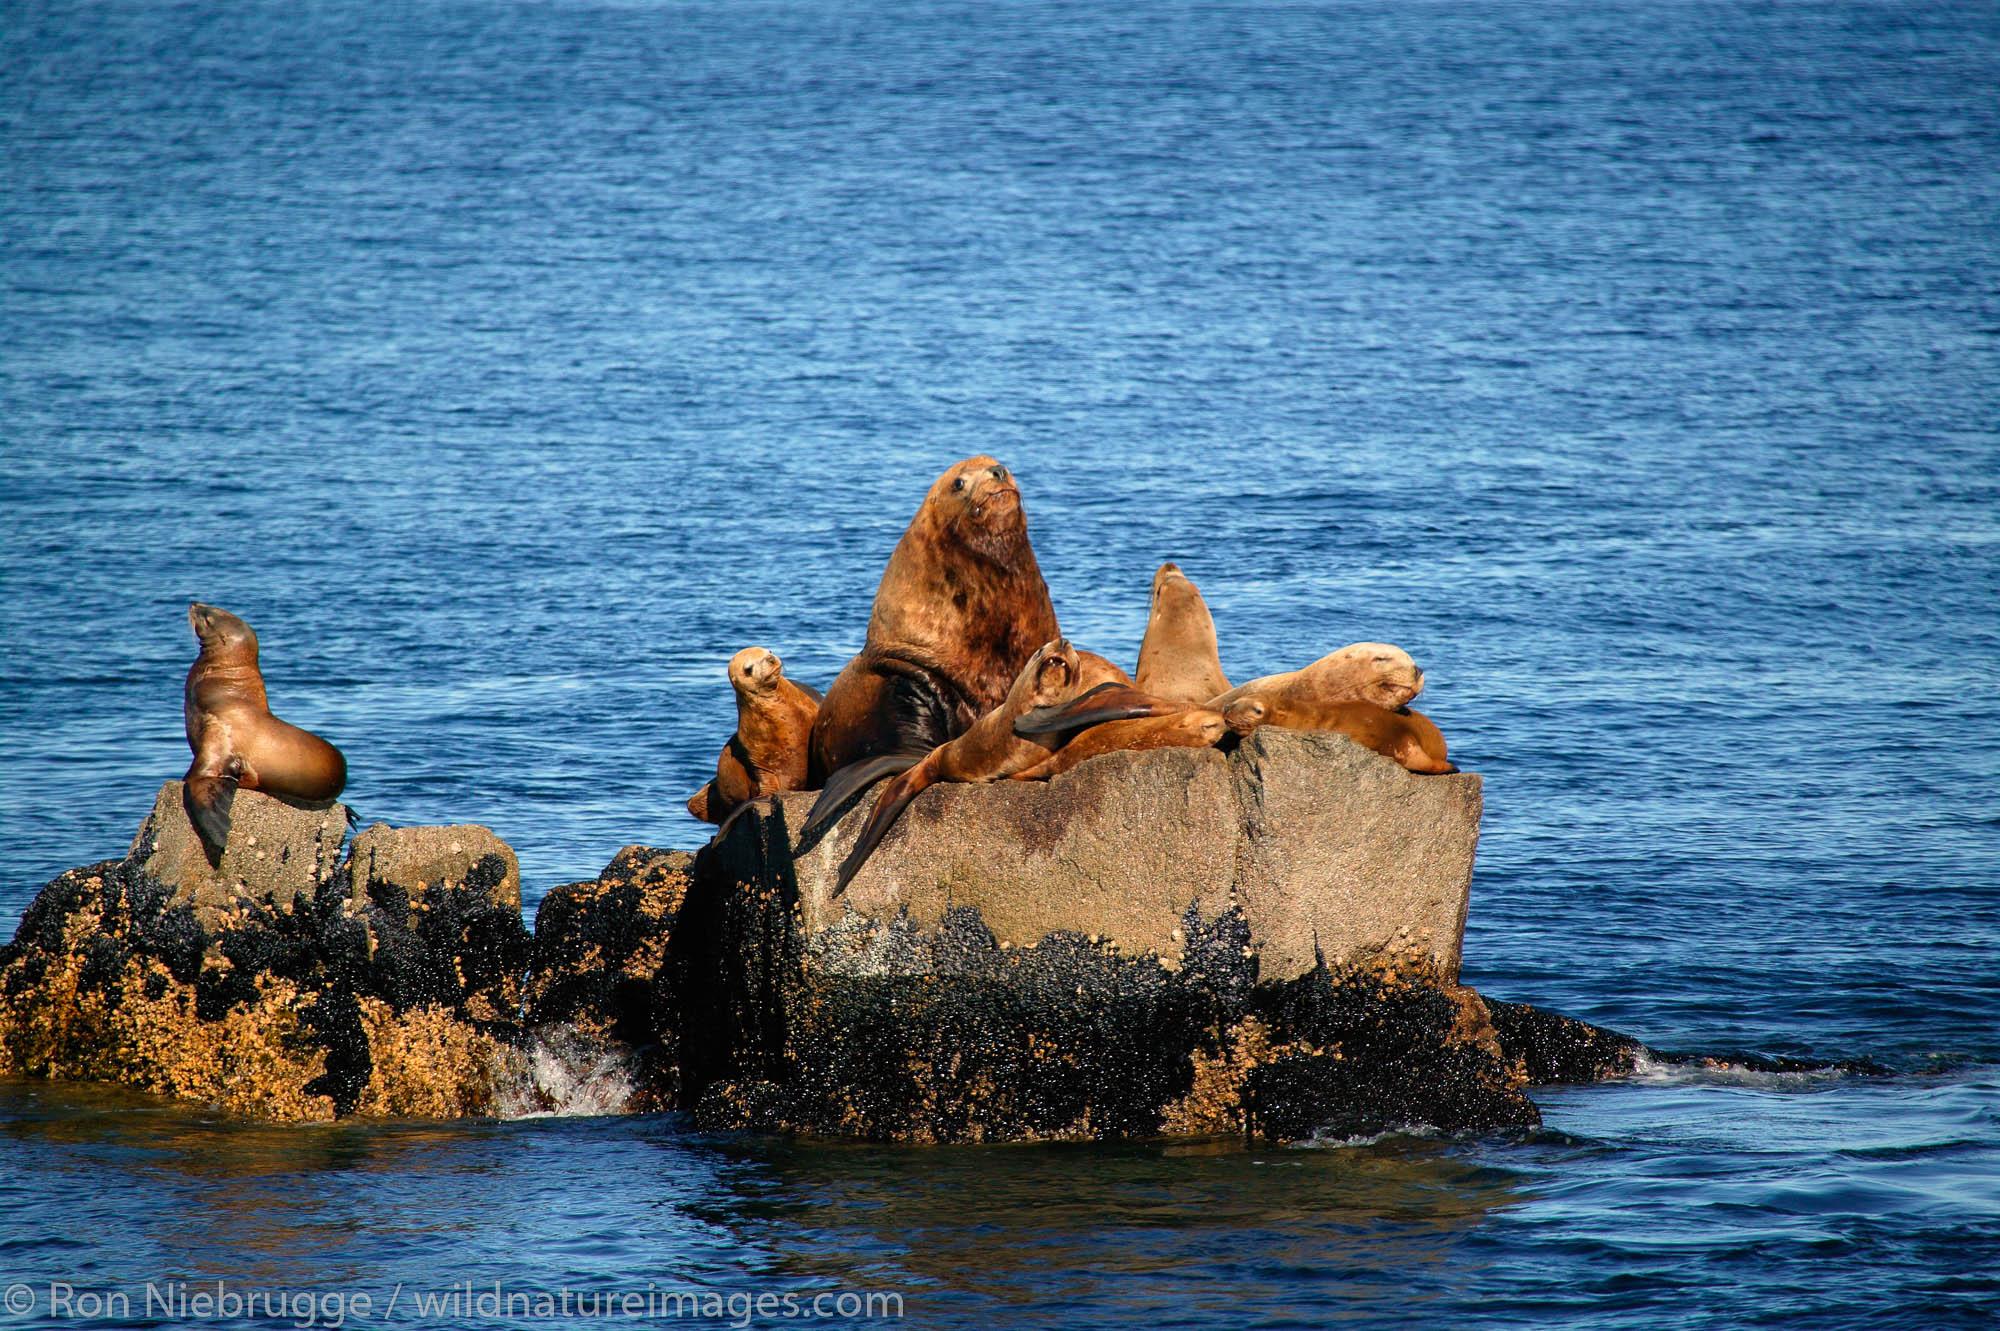 Northern Steller Sea lions, Chiswell Islands, part of the Alaska Maritime National Wildlife Refuge, Kenai Fjords National Park...